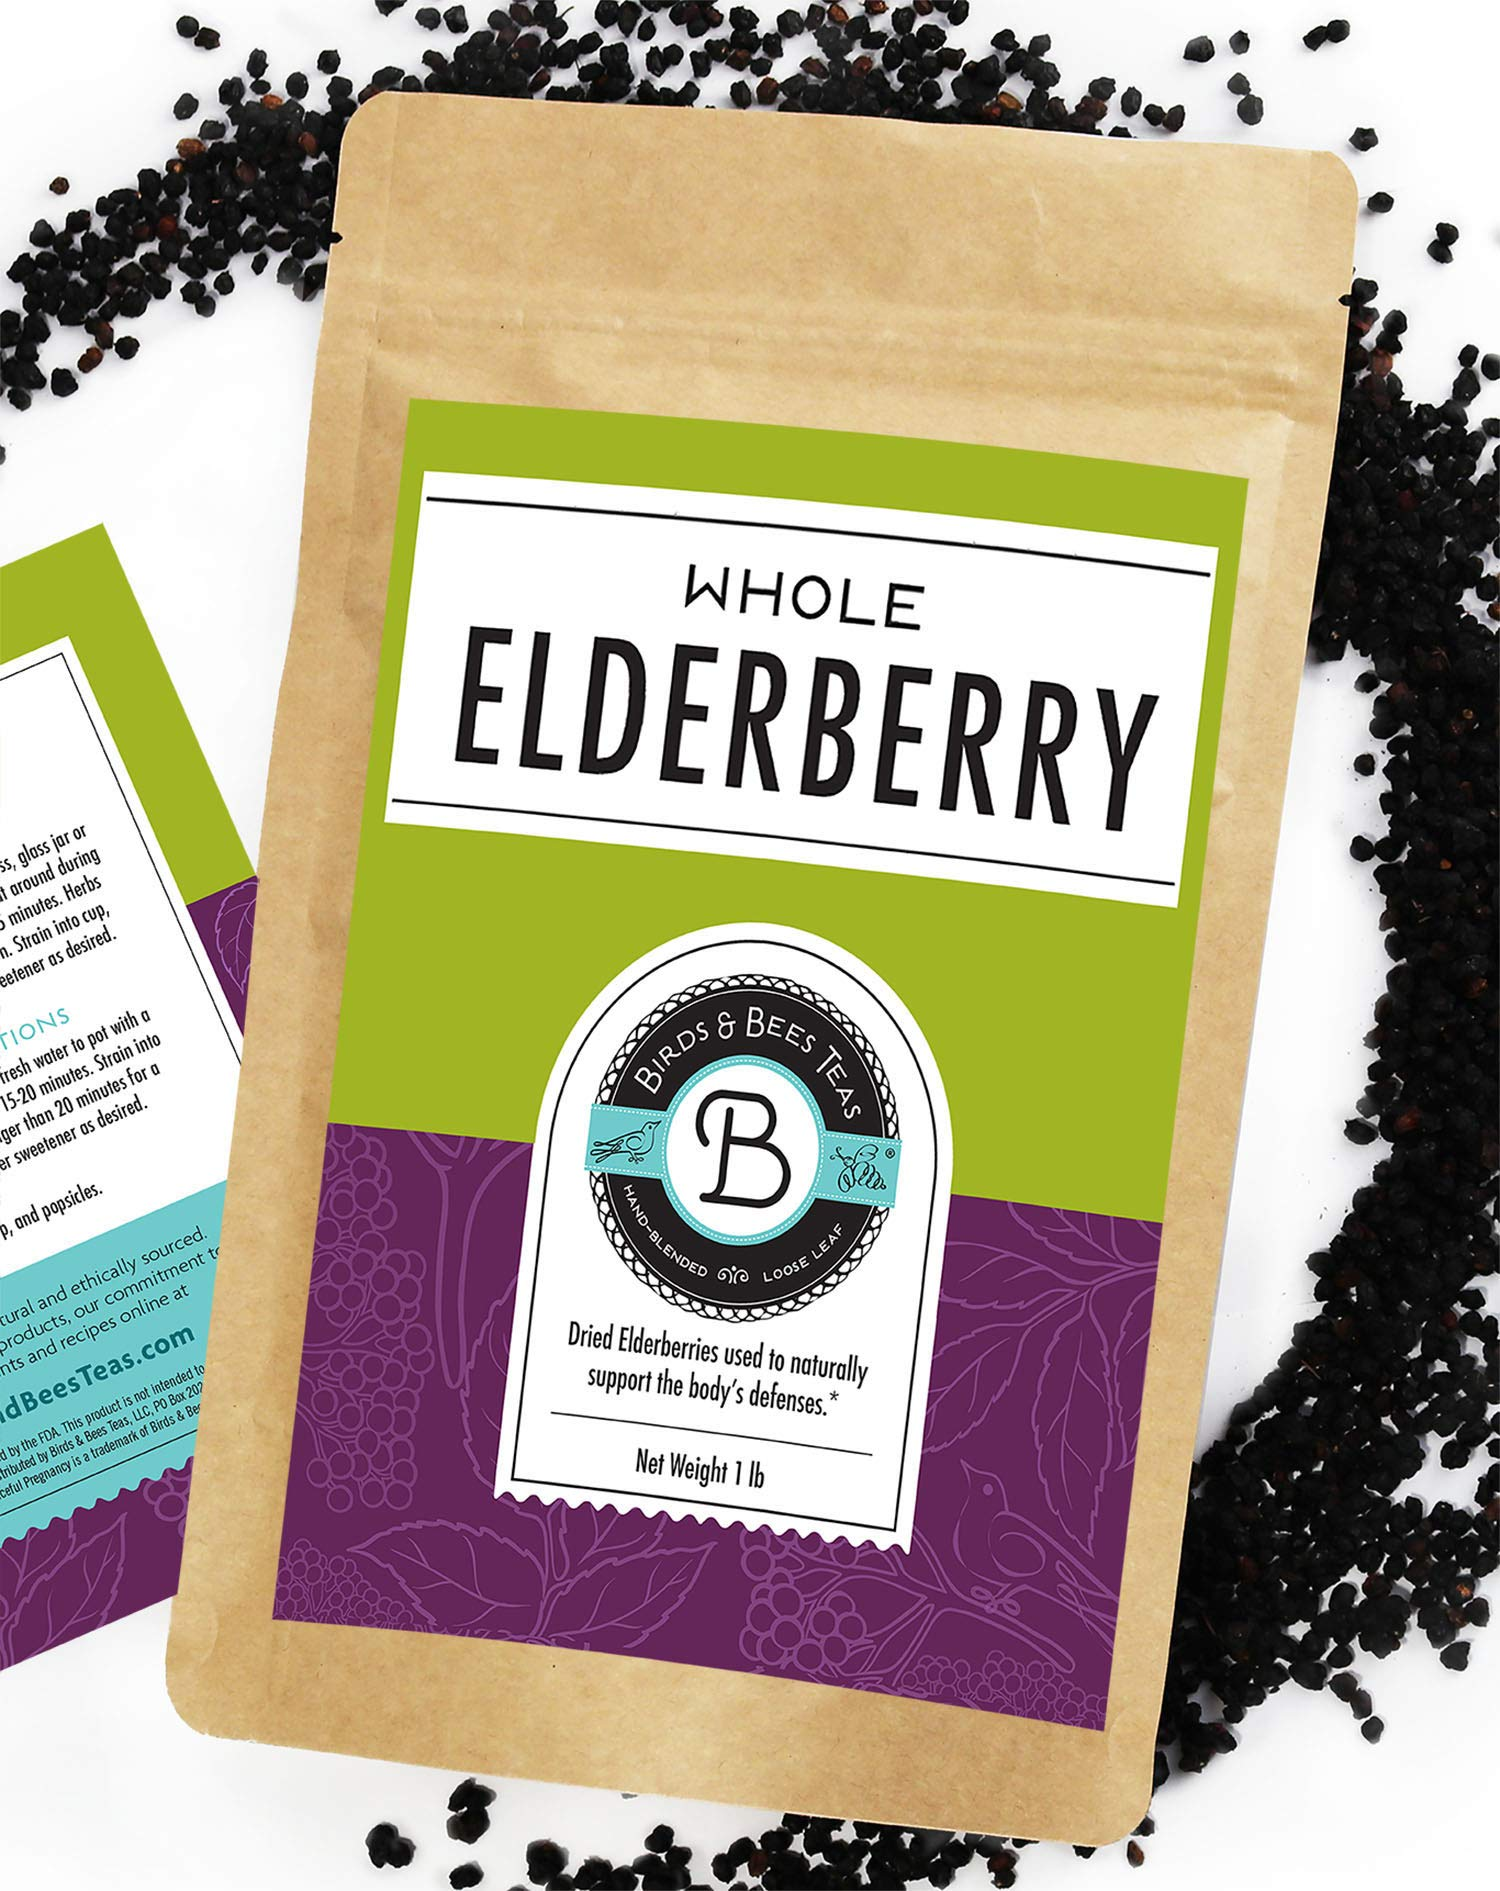 Elderberries Dried Organic 1 lb Bulk - Makes Great Elderberry Tea - Sambucus Nigra is Known for It's Immune System Booster Properties